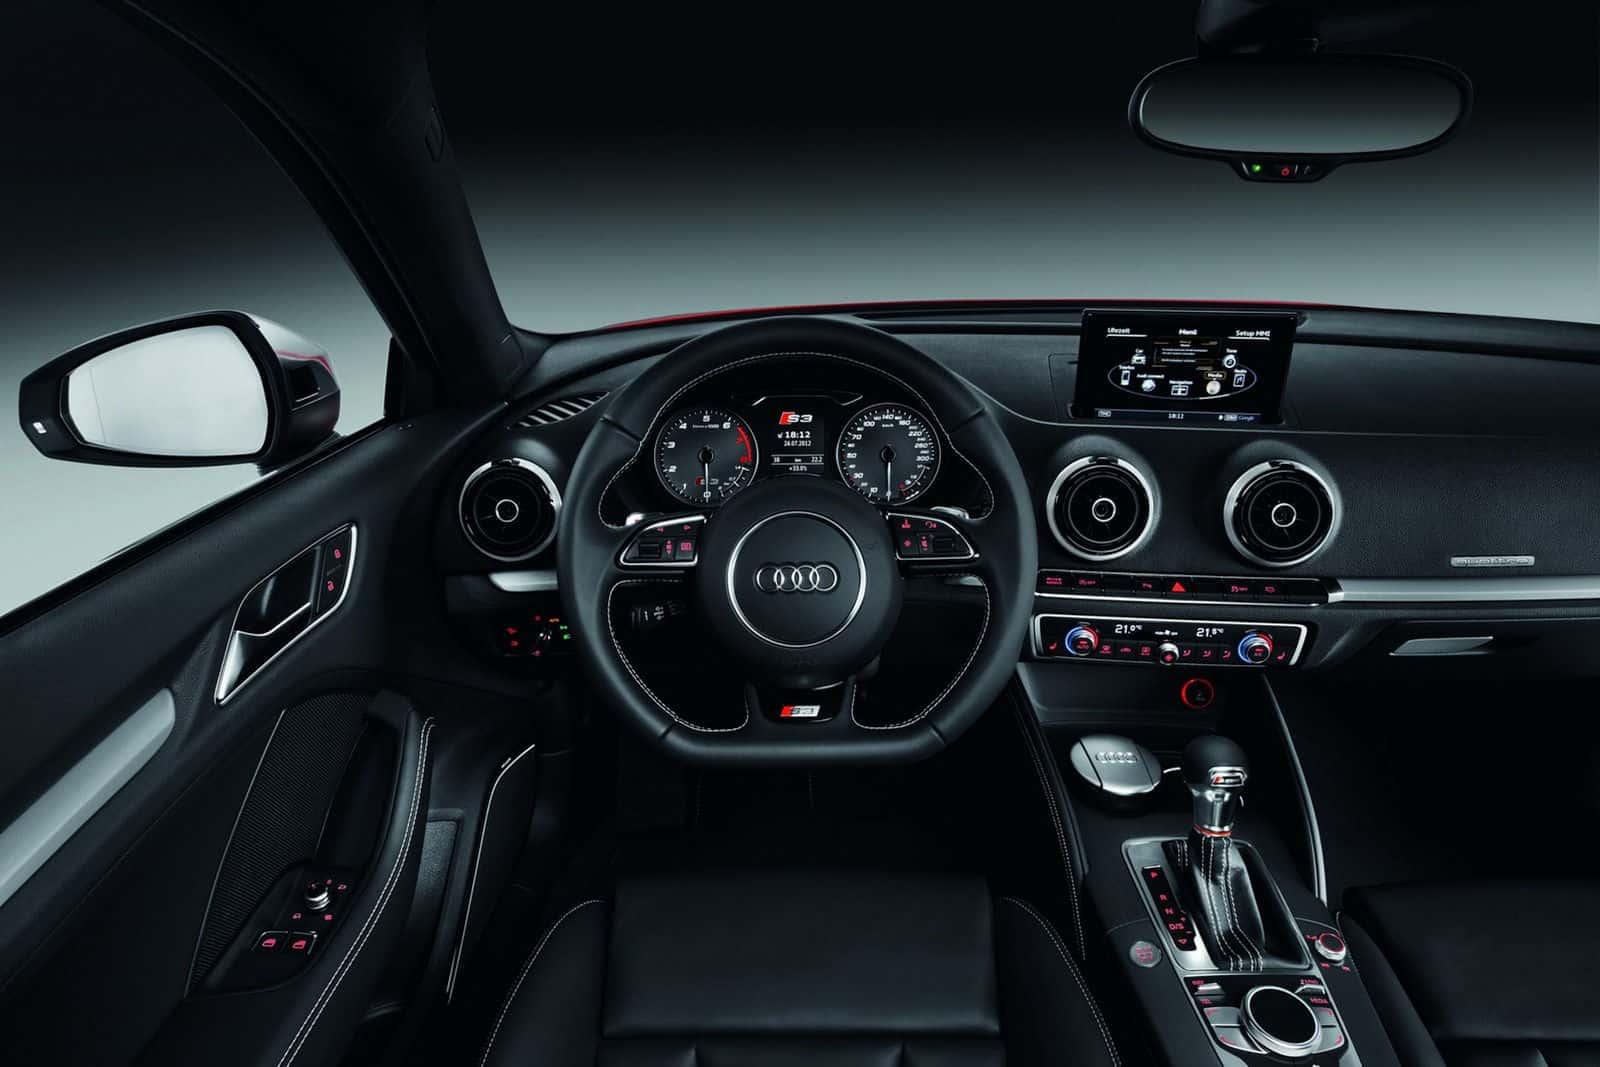 2013 Audi S3 Hatchback dashboard